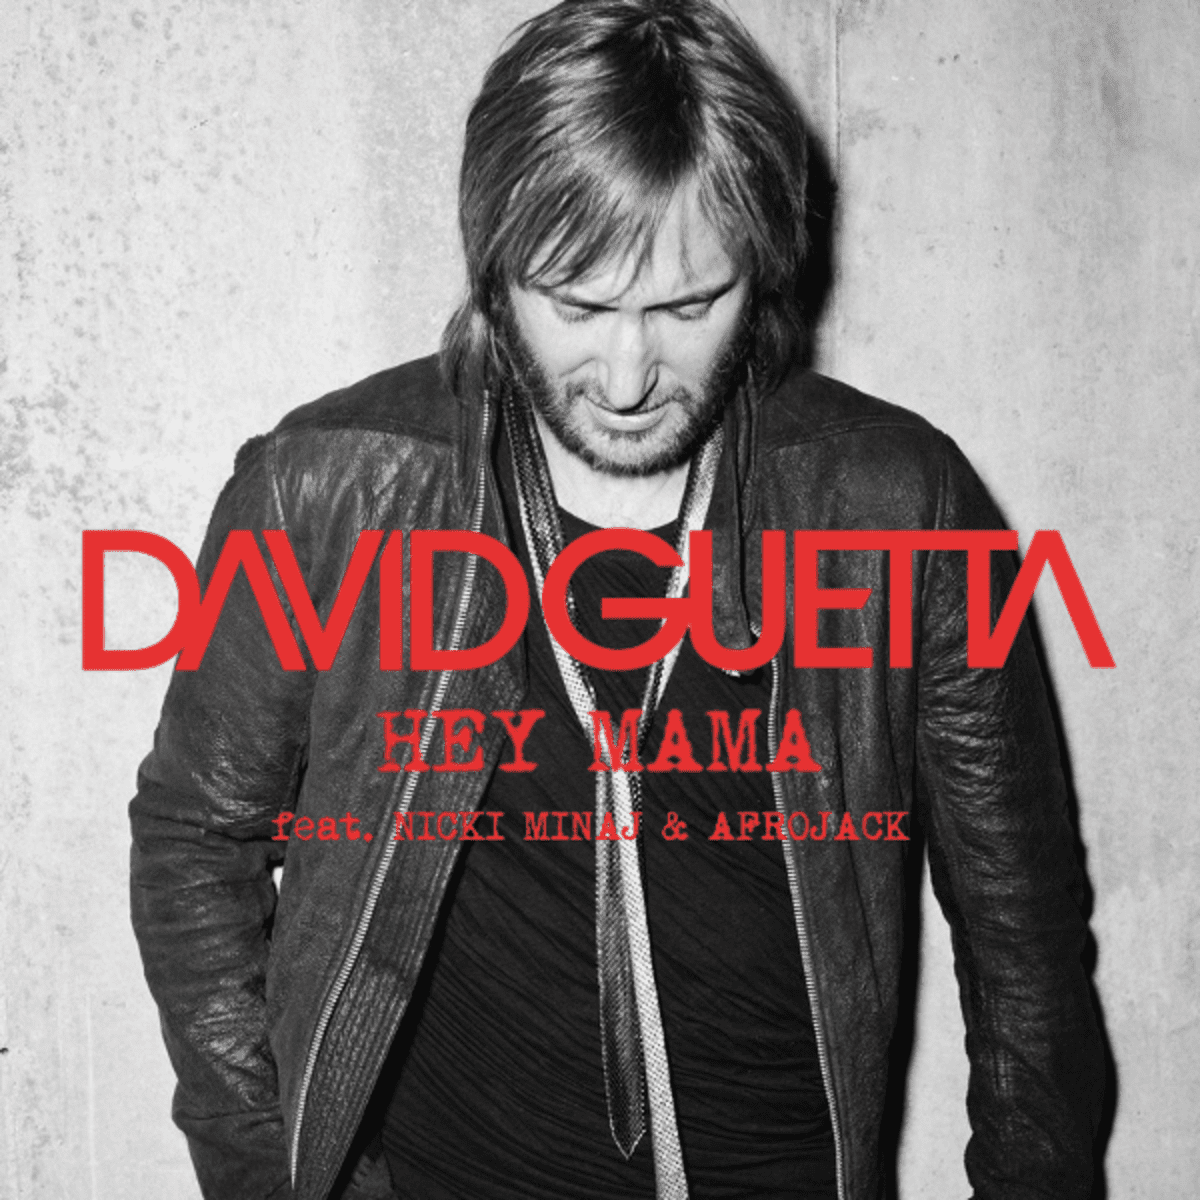 David Guetta - Hey Mama featuring Nicki Minaj and Afrojack